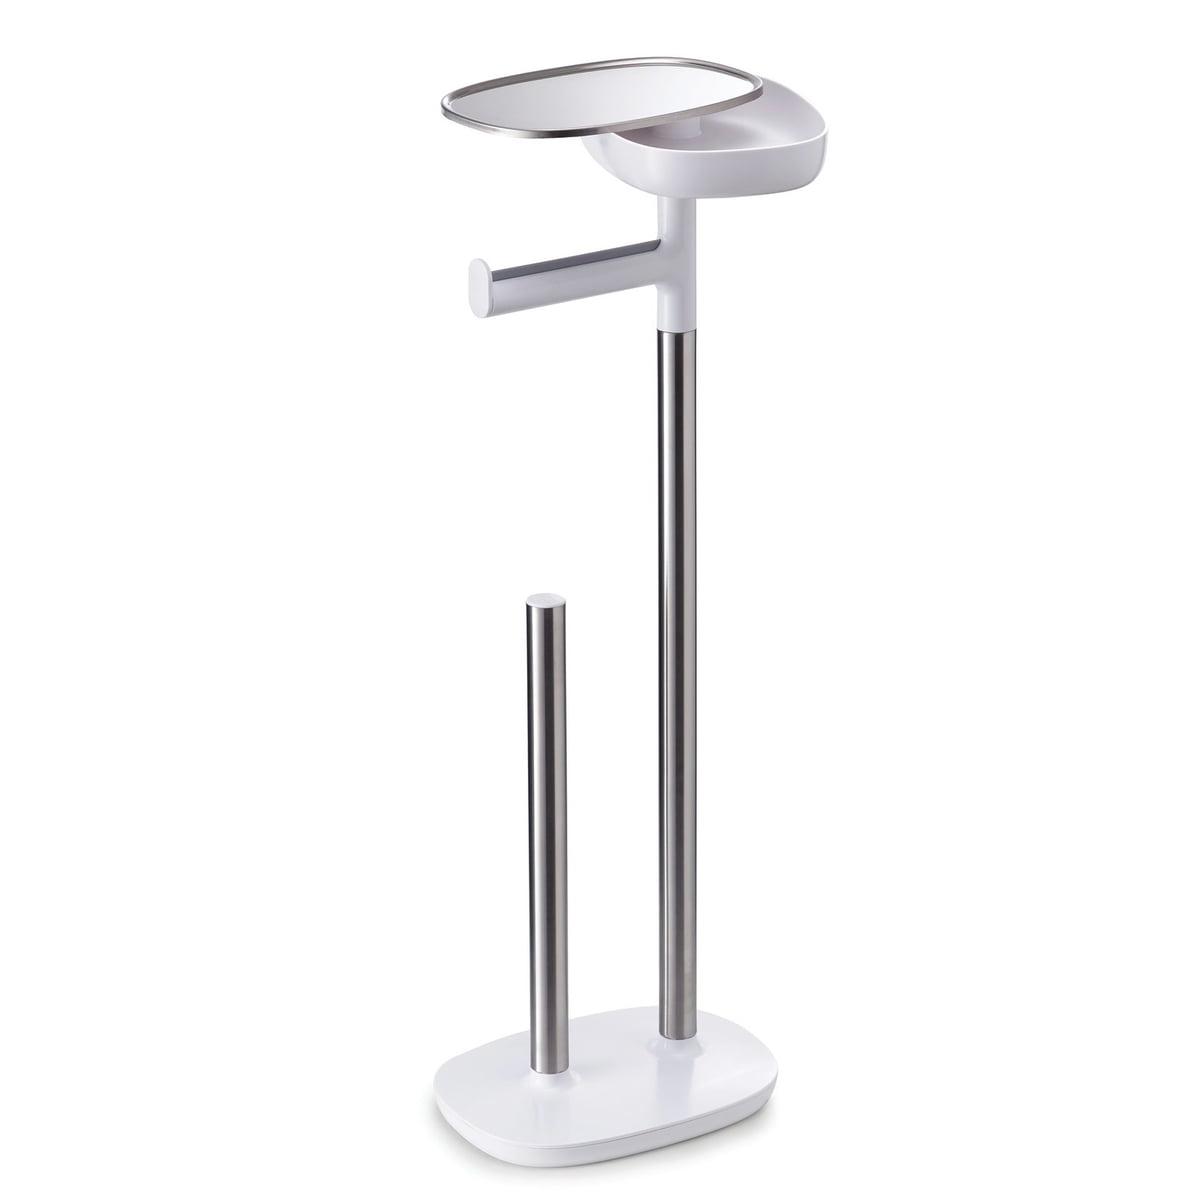 Edelstahl Edelstahl Toilettenpapierhalter Online Kaufen Möbel